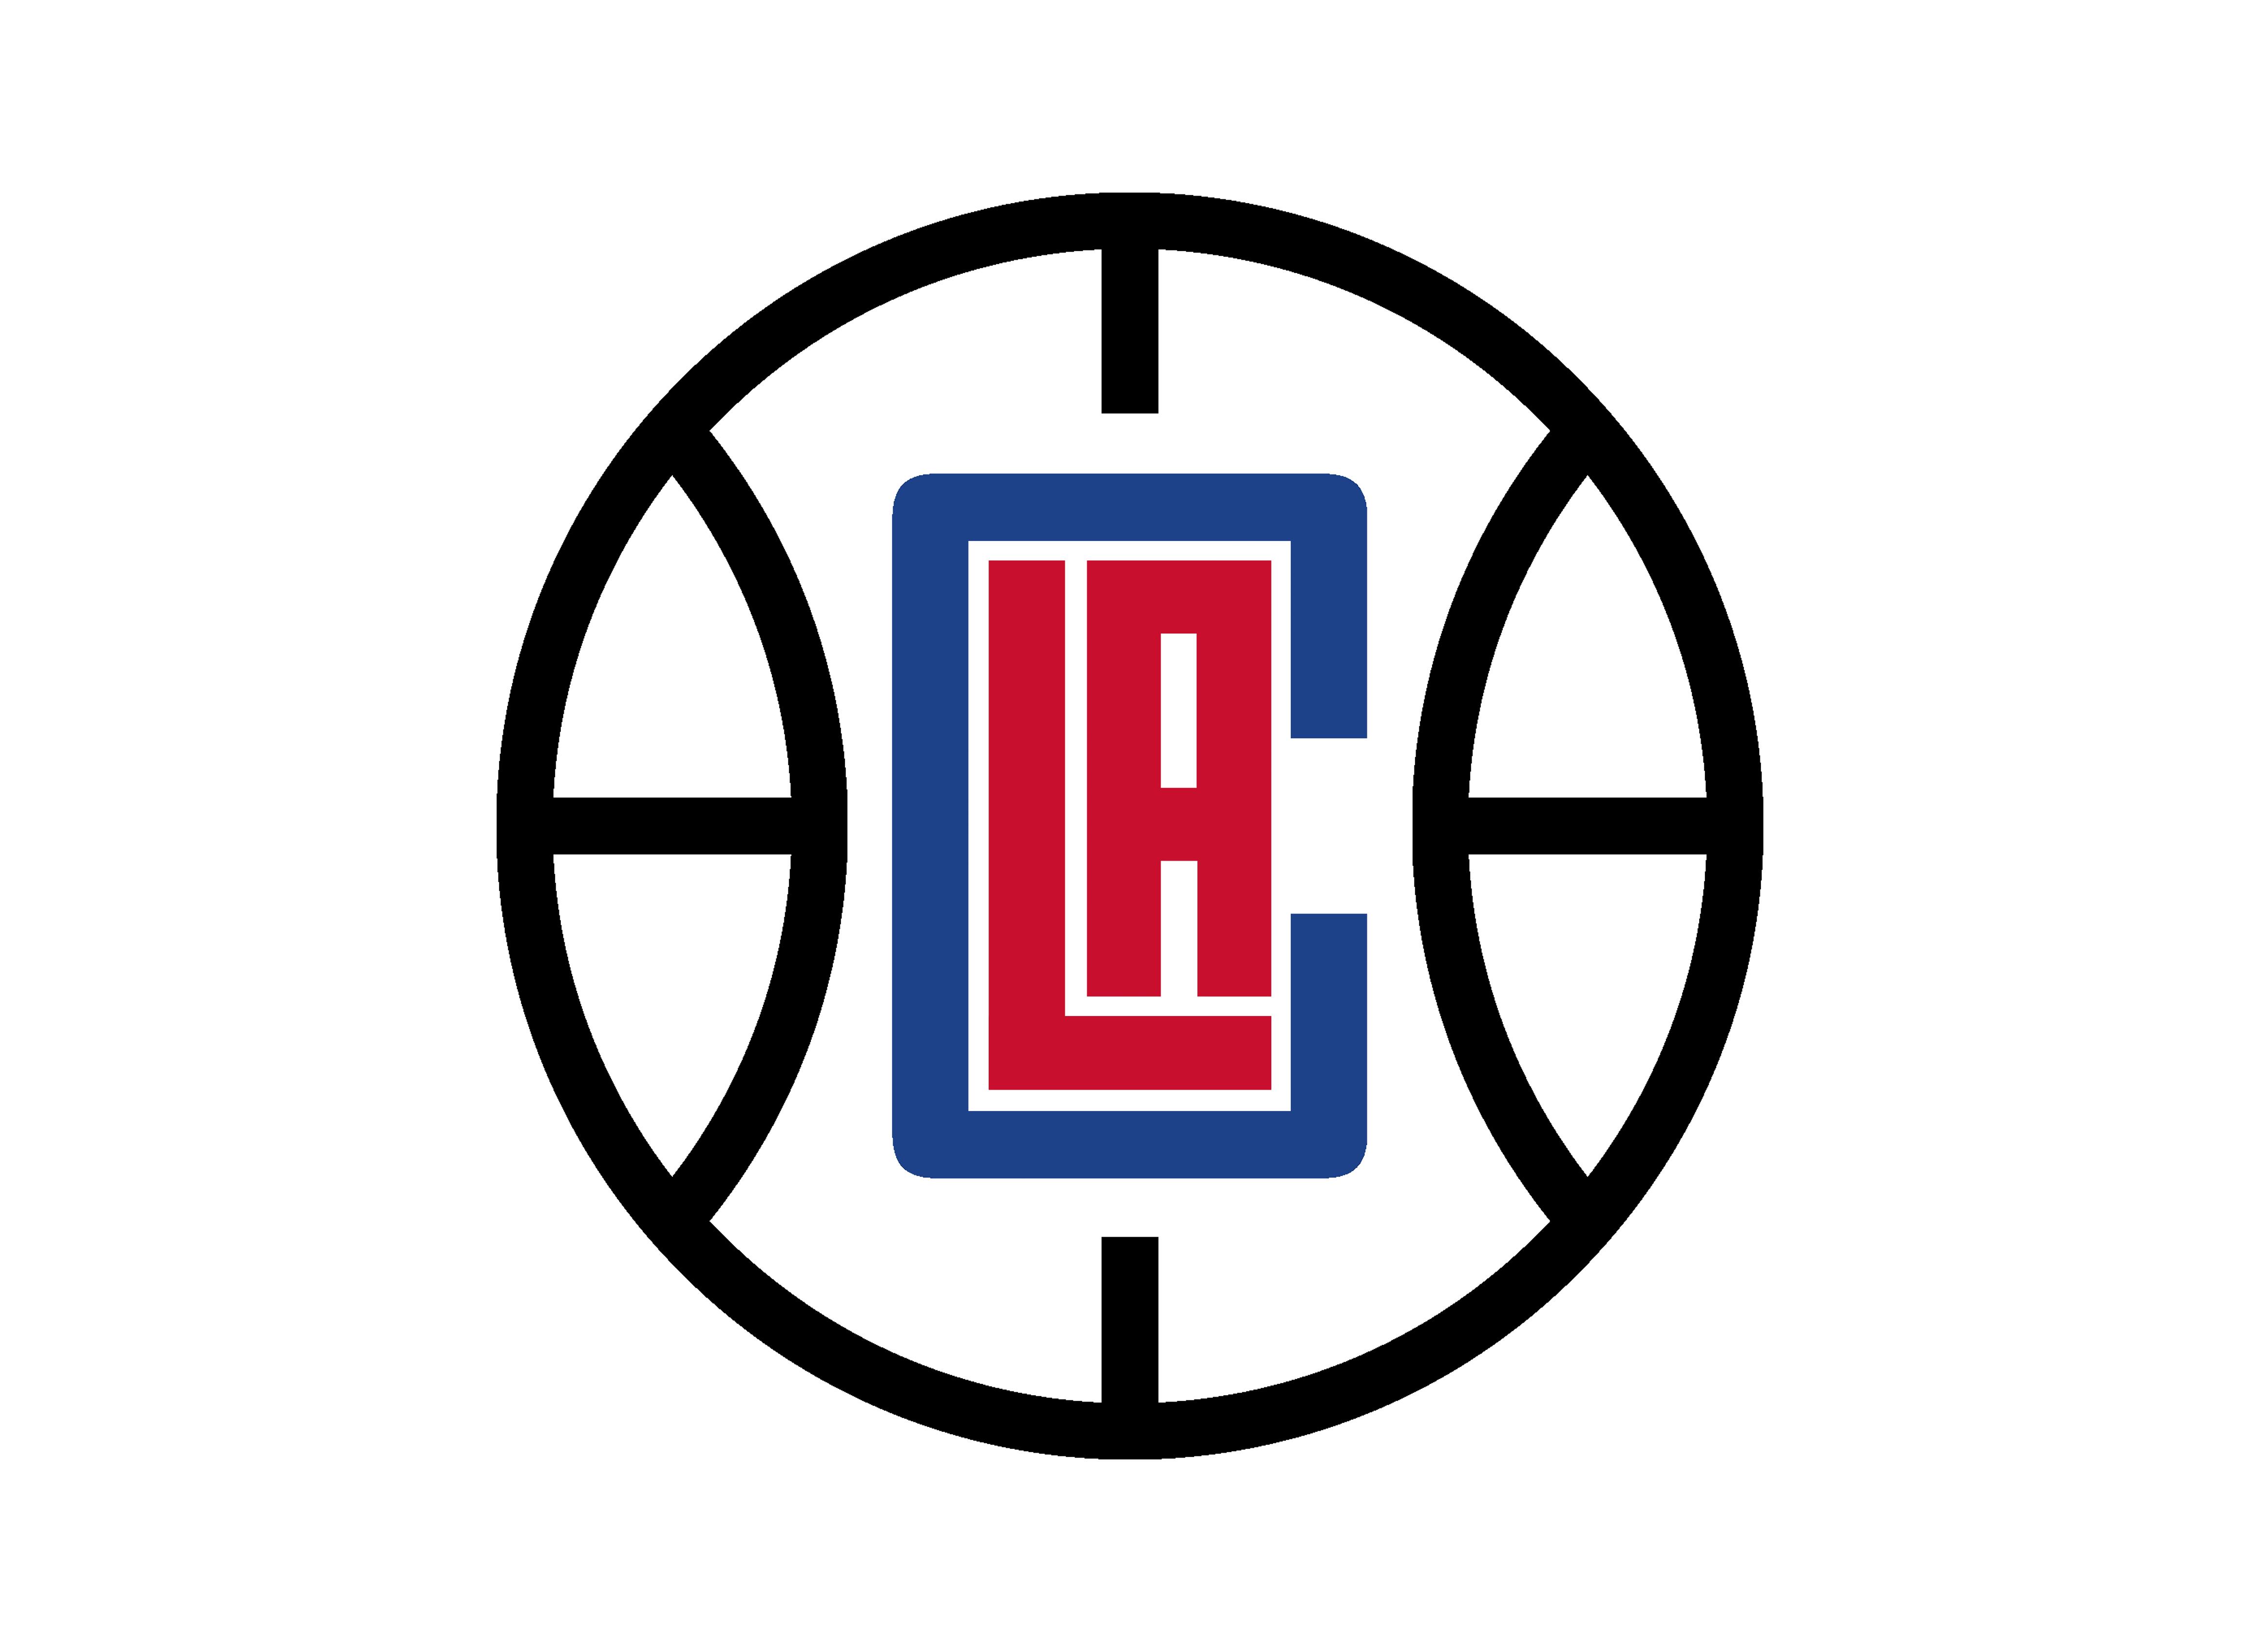 Los Angeles Clippers Los Angeles Clippers La Clippers Wincraft